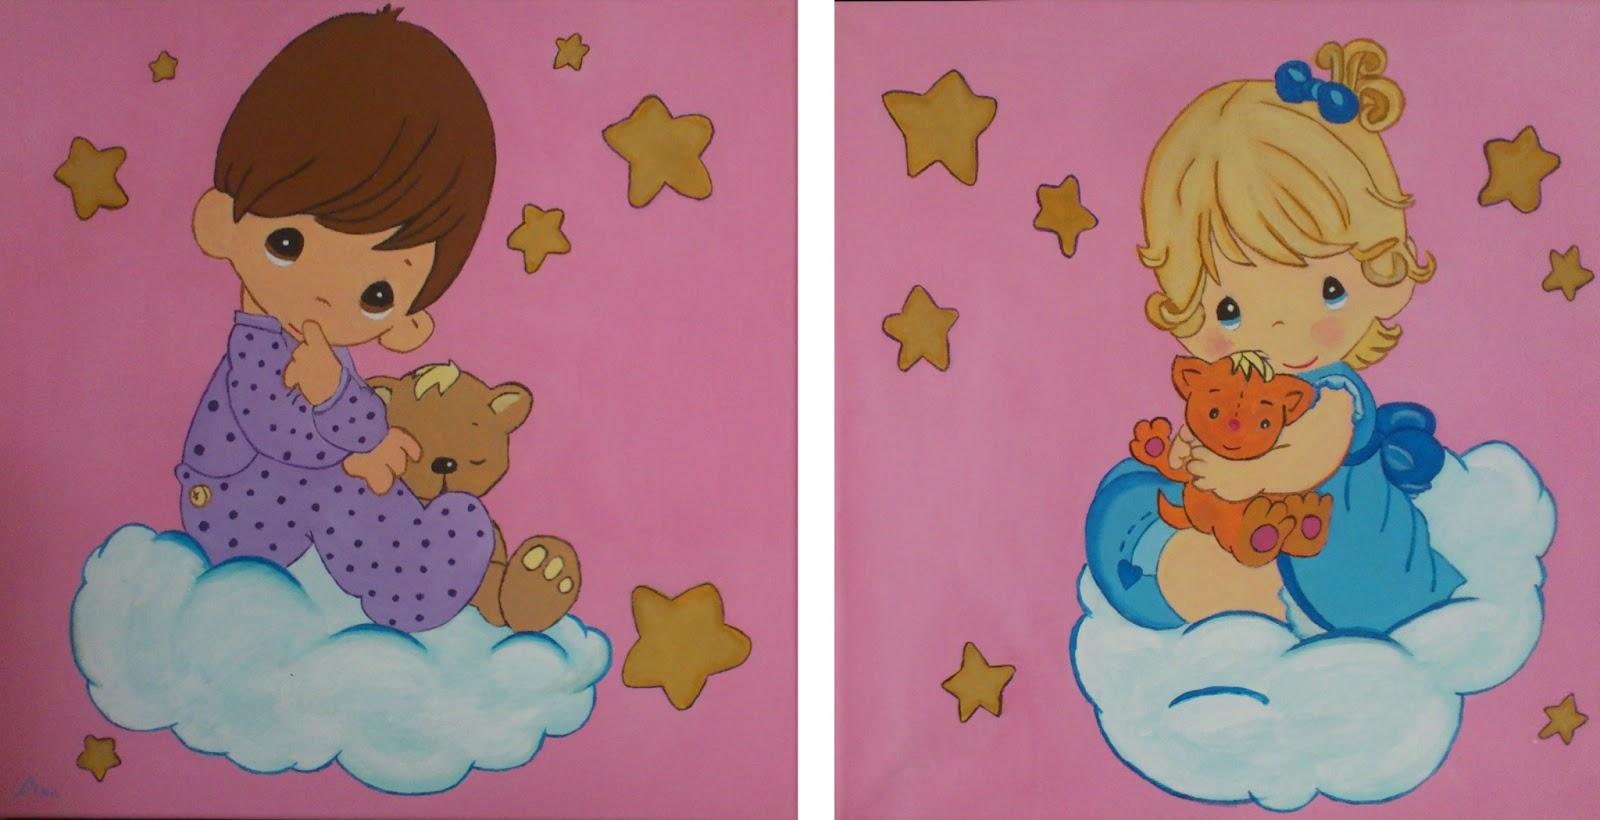 Pintando historias contando cuadros cuadros infantiles - Laminas infantiles para cuadros ...